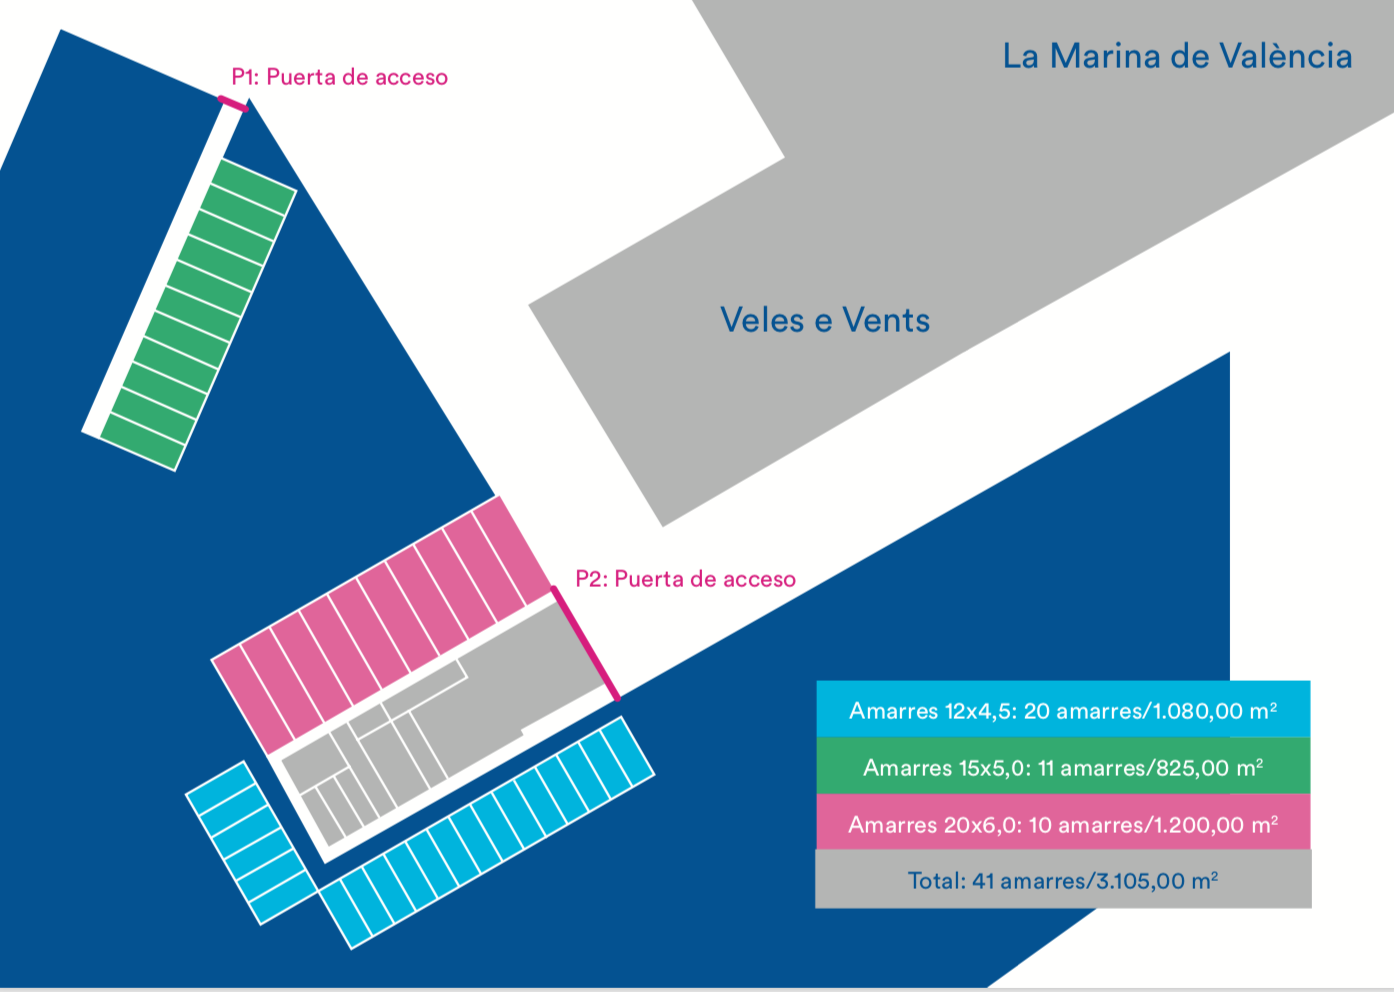 La Marina de València estrenará nueva zona de amarres a los pies del Veles e Vents